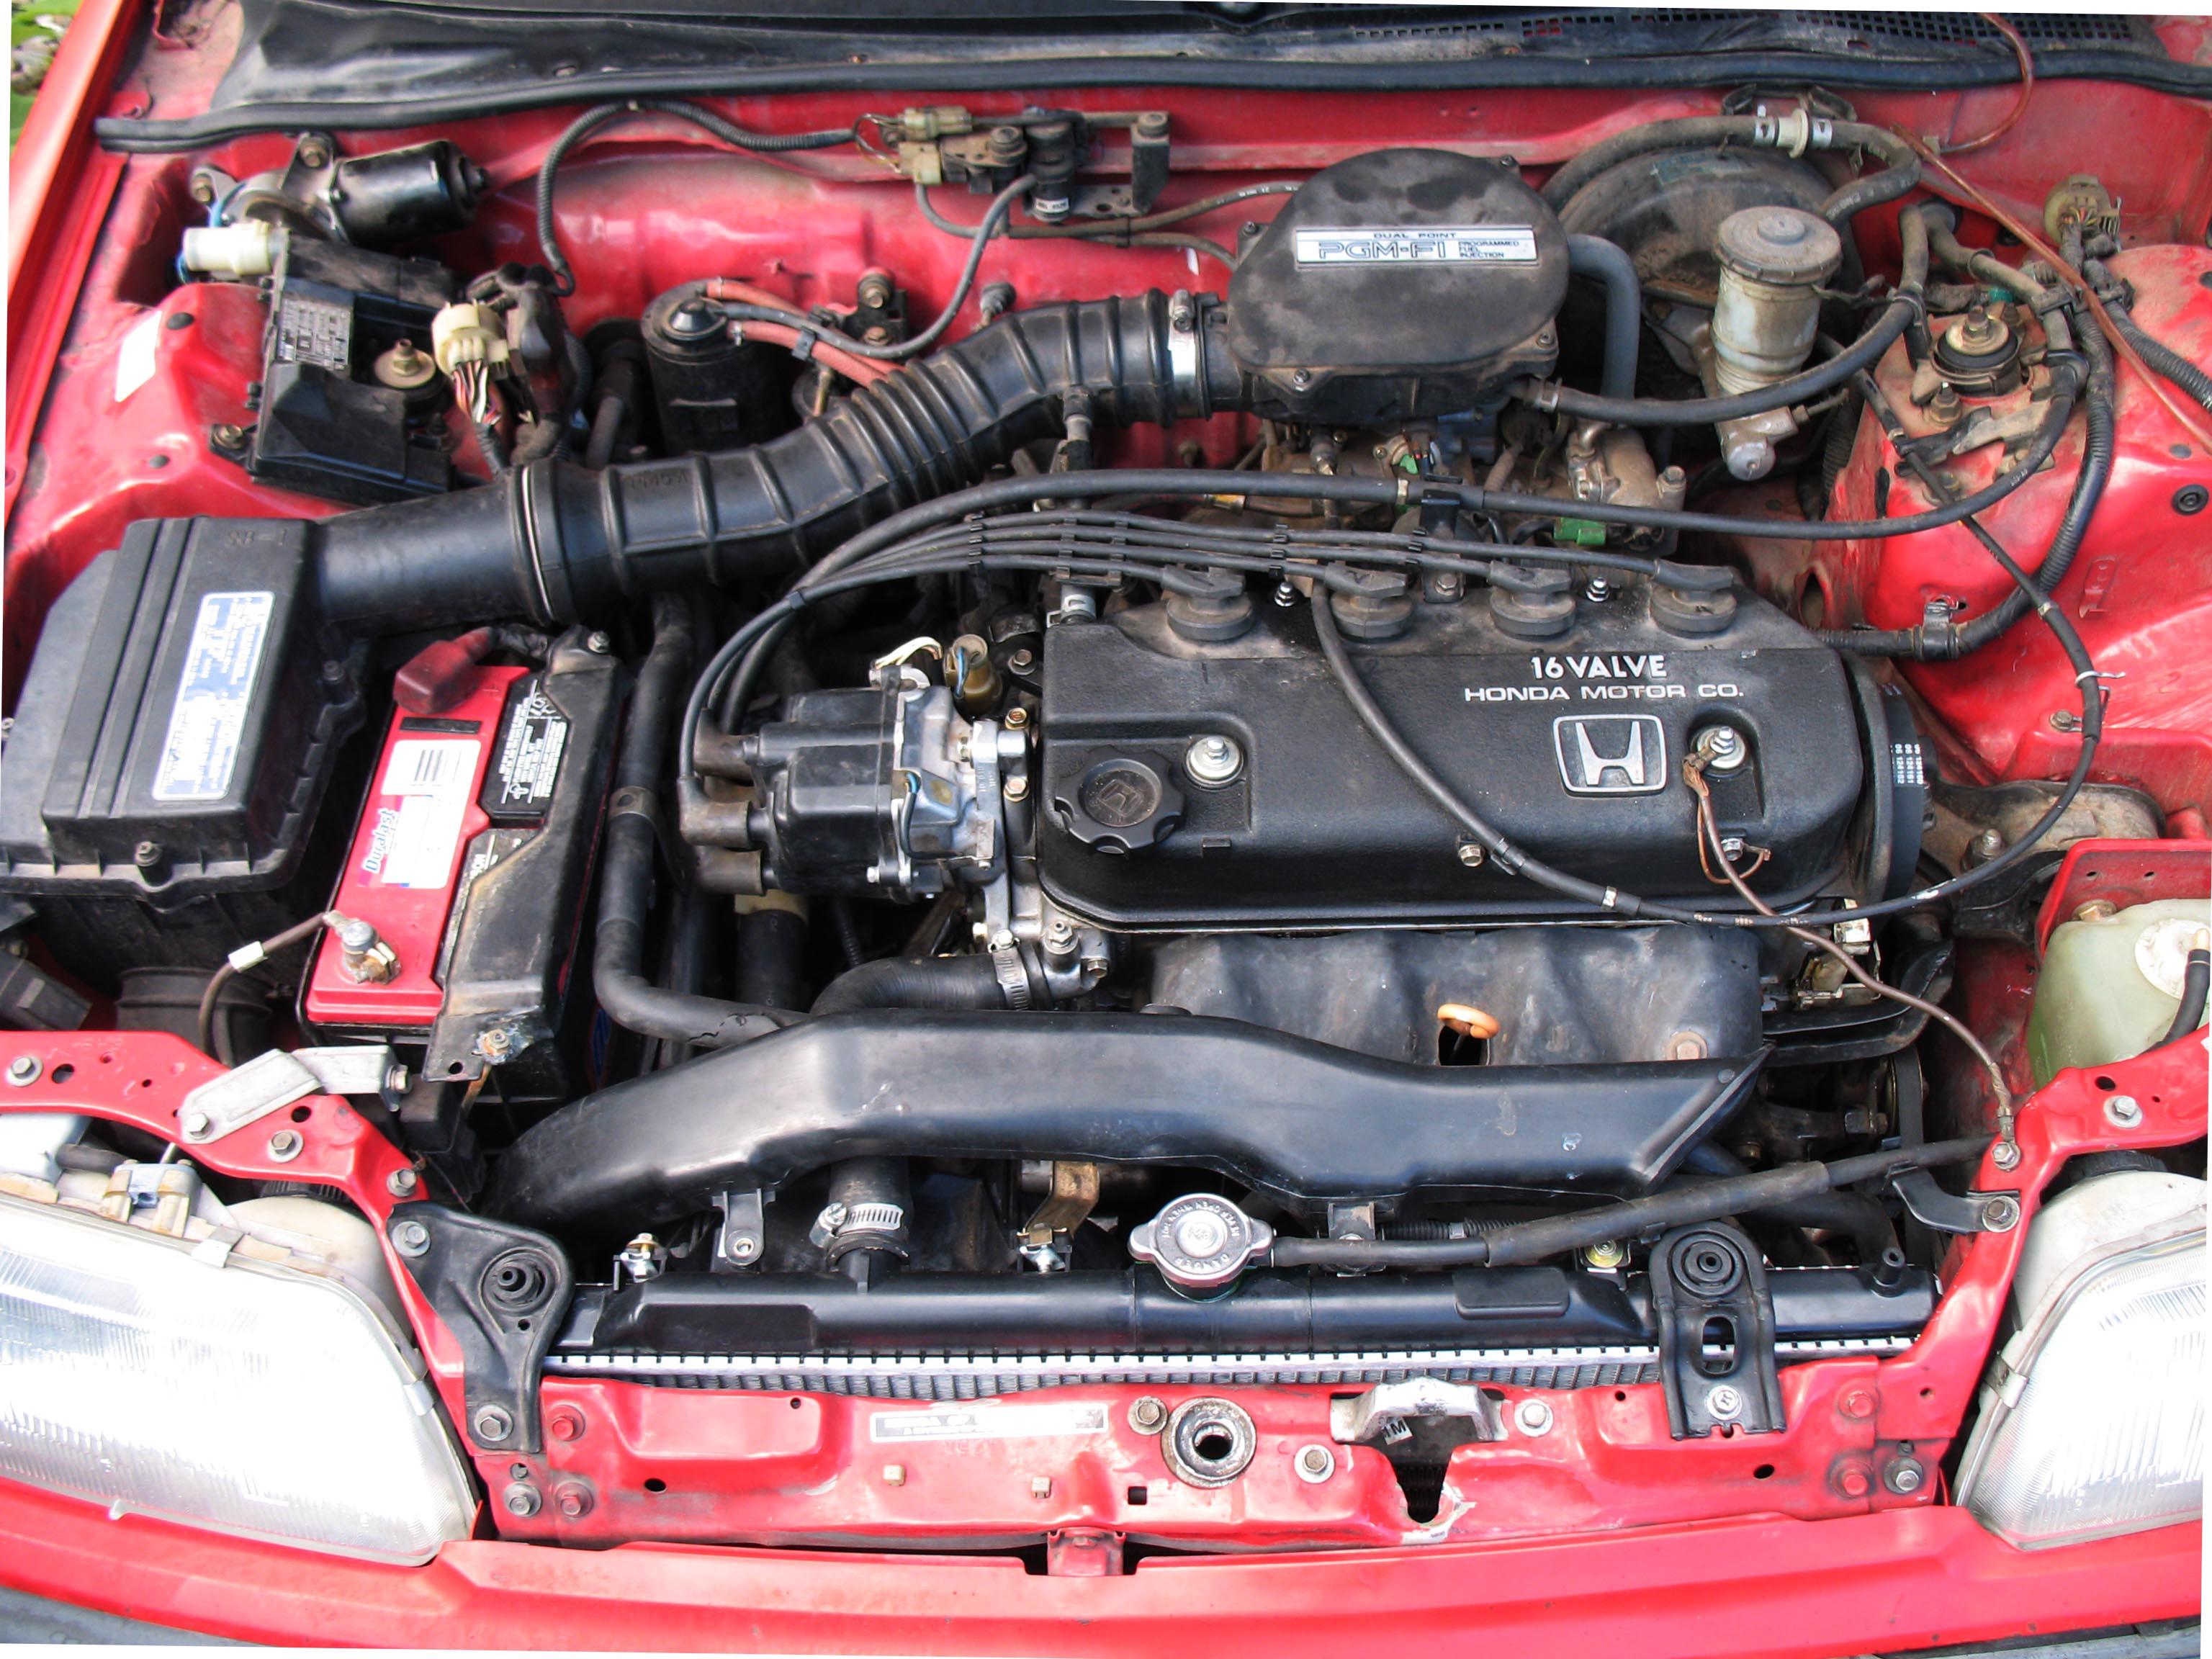 small resolution of 91 accord engine head diagram wiring library91 accord engine head diagram